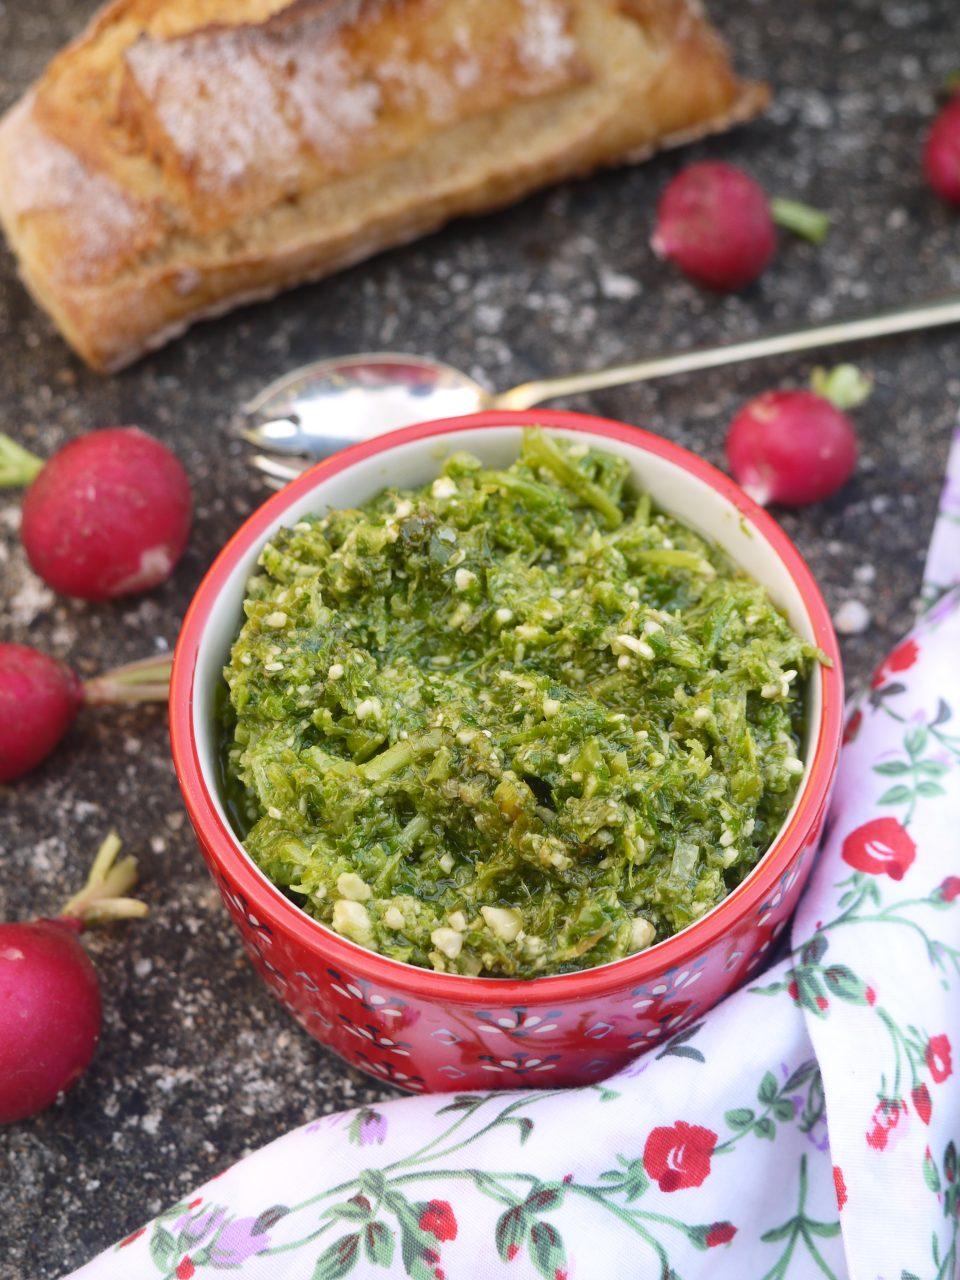 pesto-faneradis-vegetalien-betty